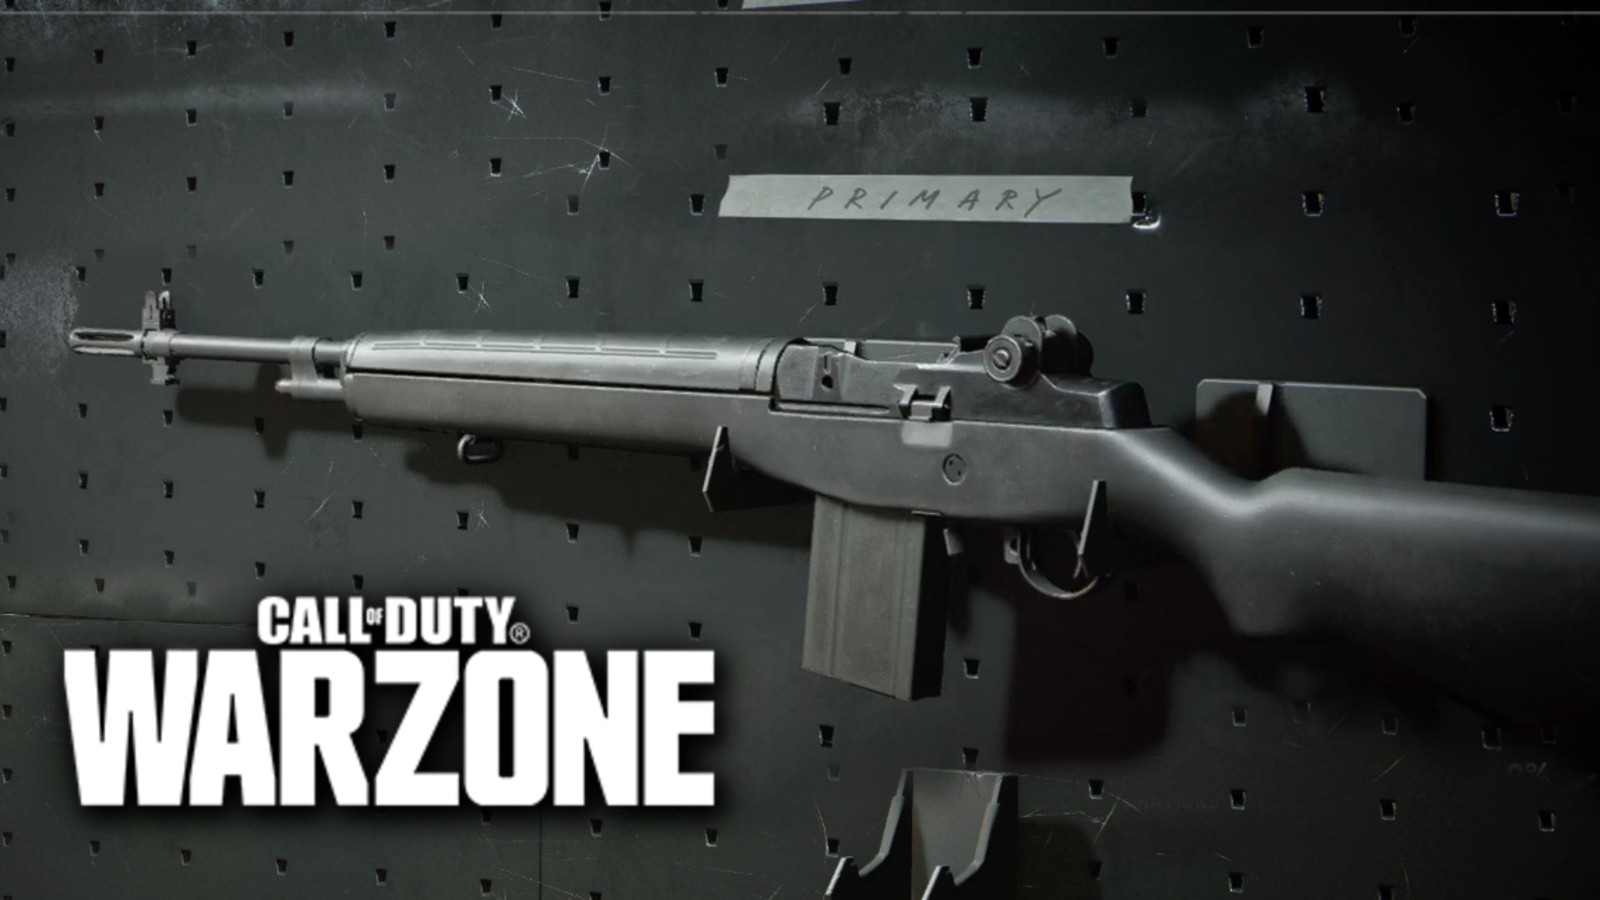 DMR-14 Warzone